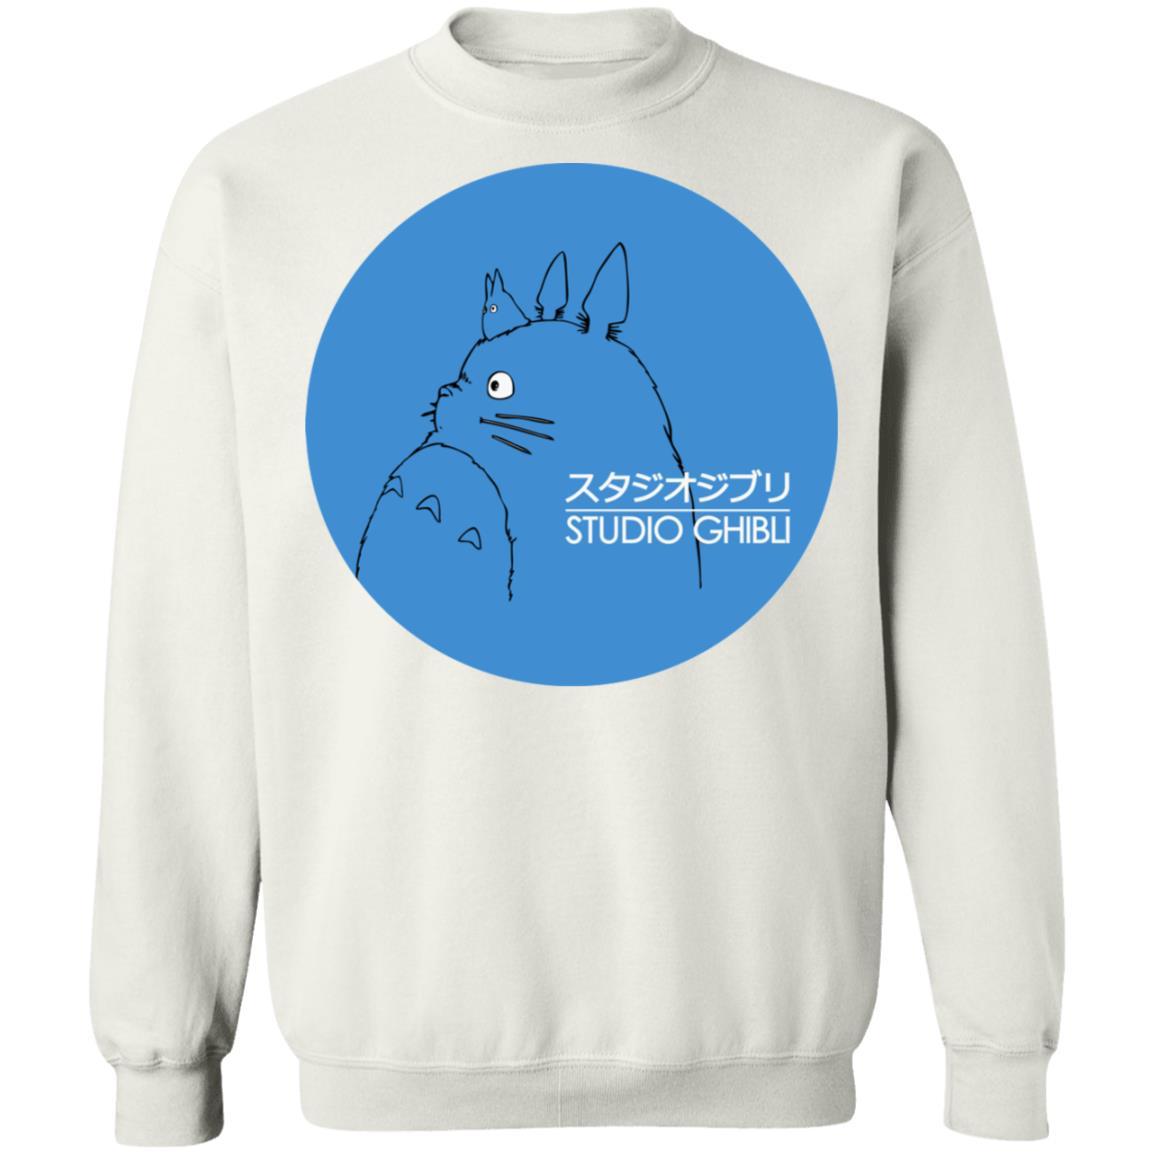 Studio Ghibli Logo Sweatshirt Unisex